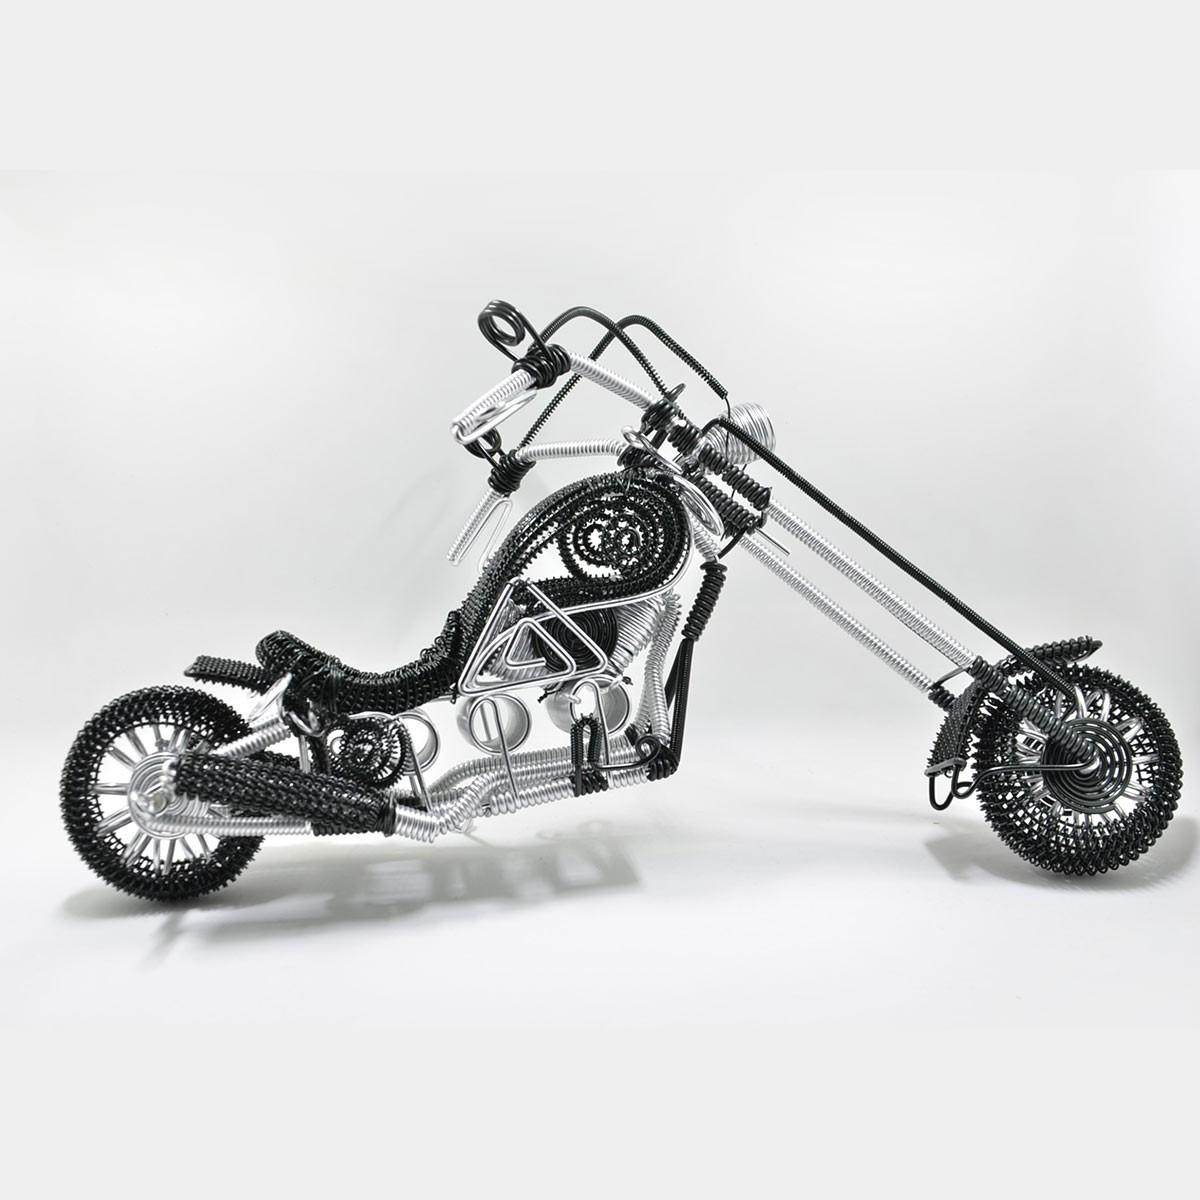 Harley-Davidson Motorcycle Model Sculpture Aluminium Wire Art - Black